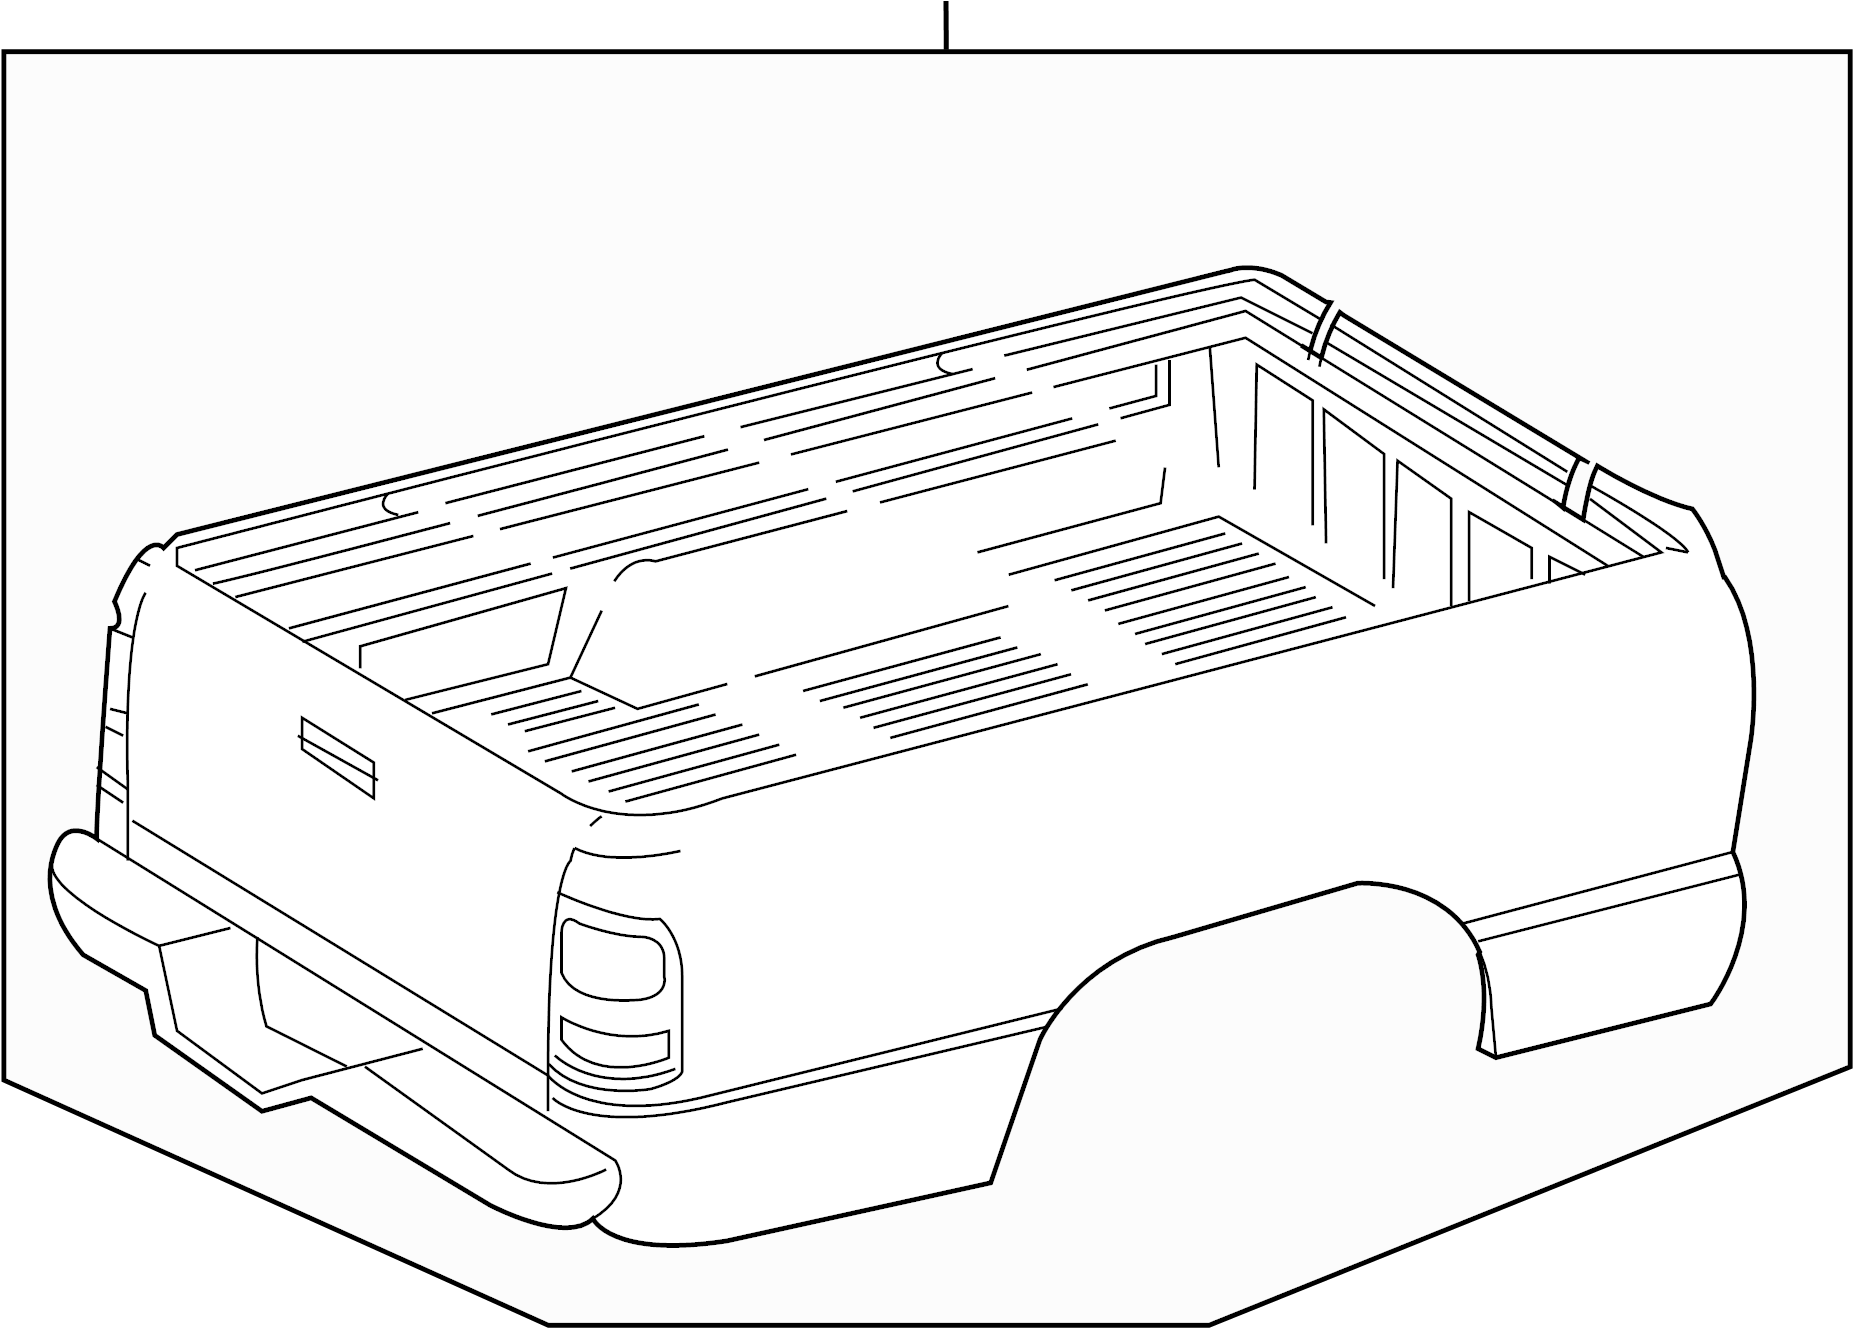 2014 honda crv fuse box cover detail